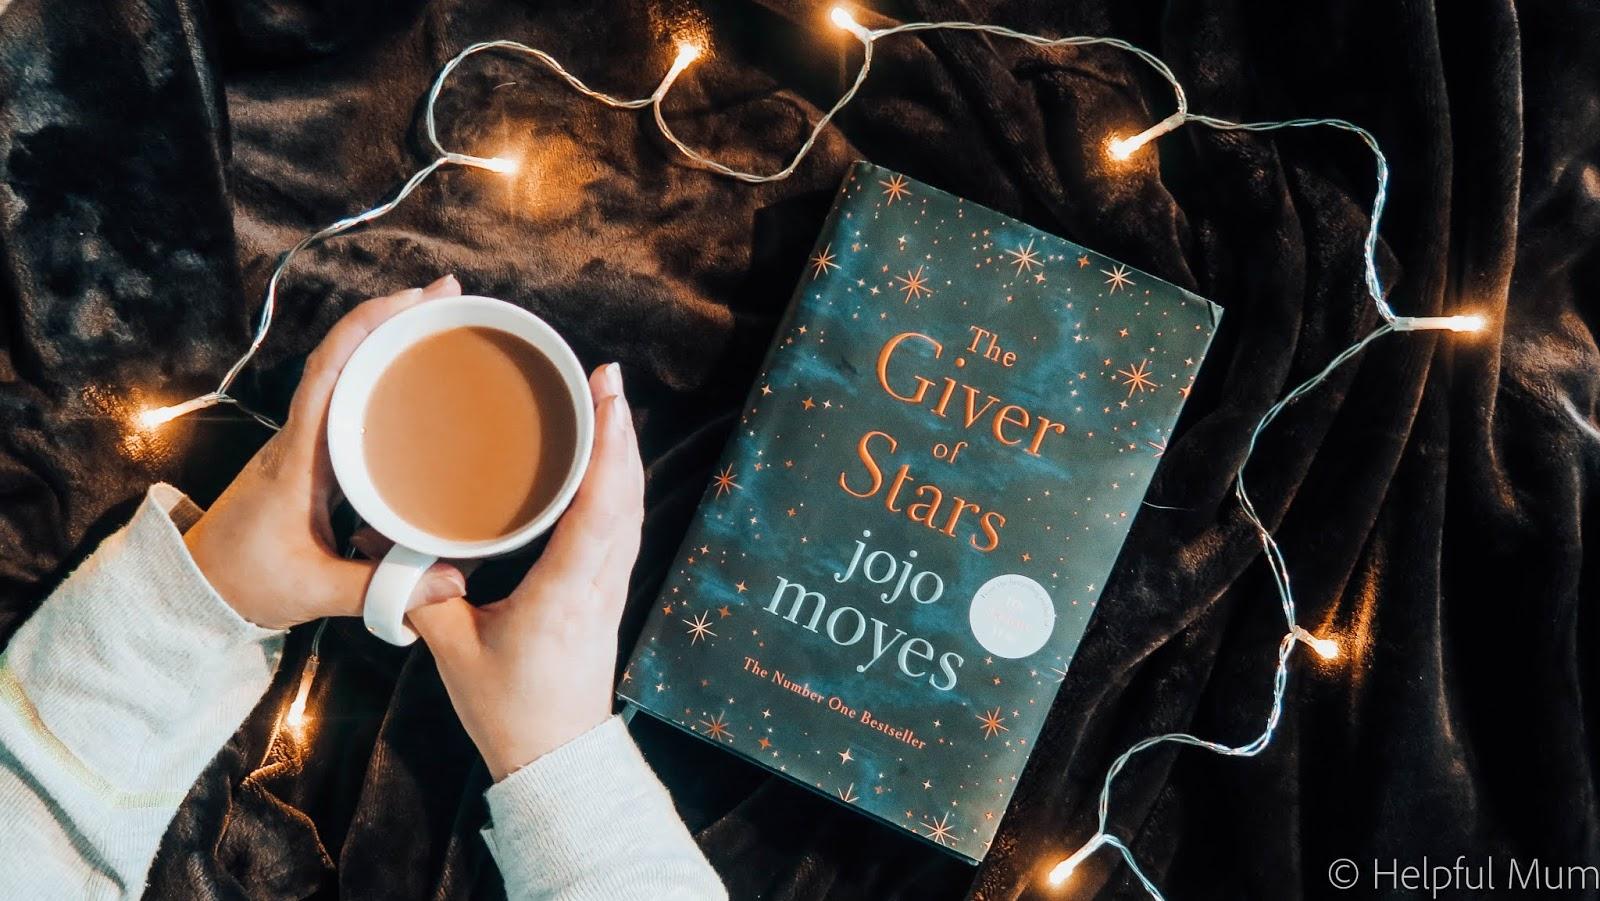 Jojo Moyes Giver of Stars